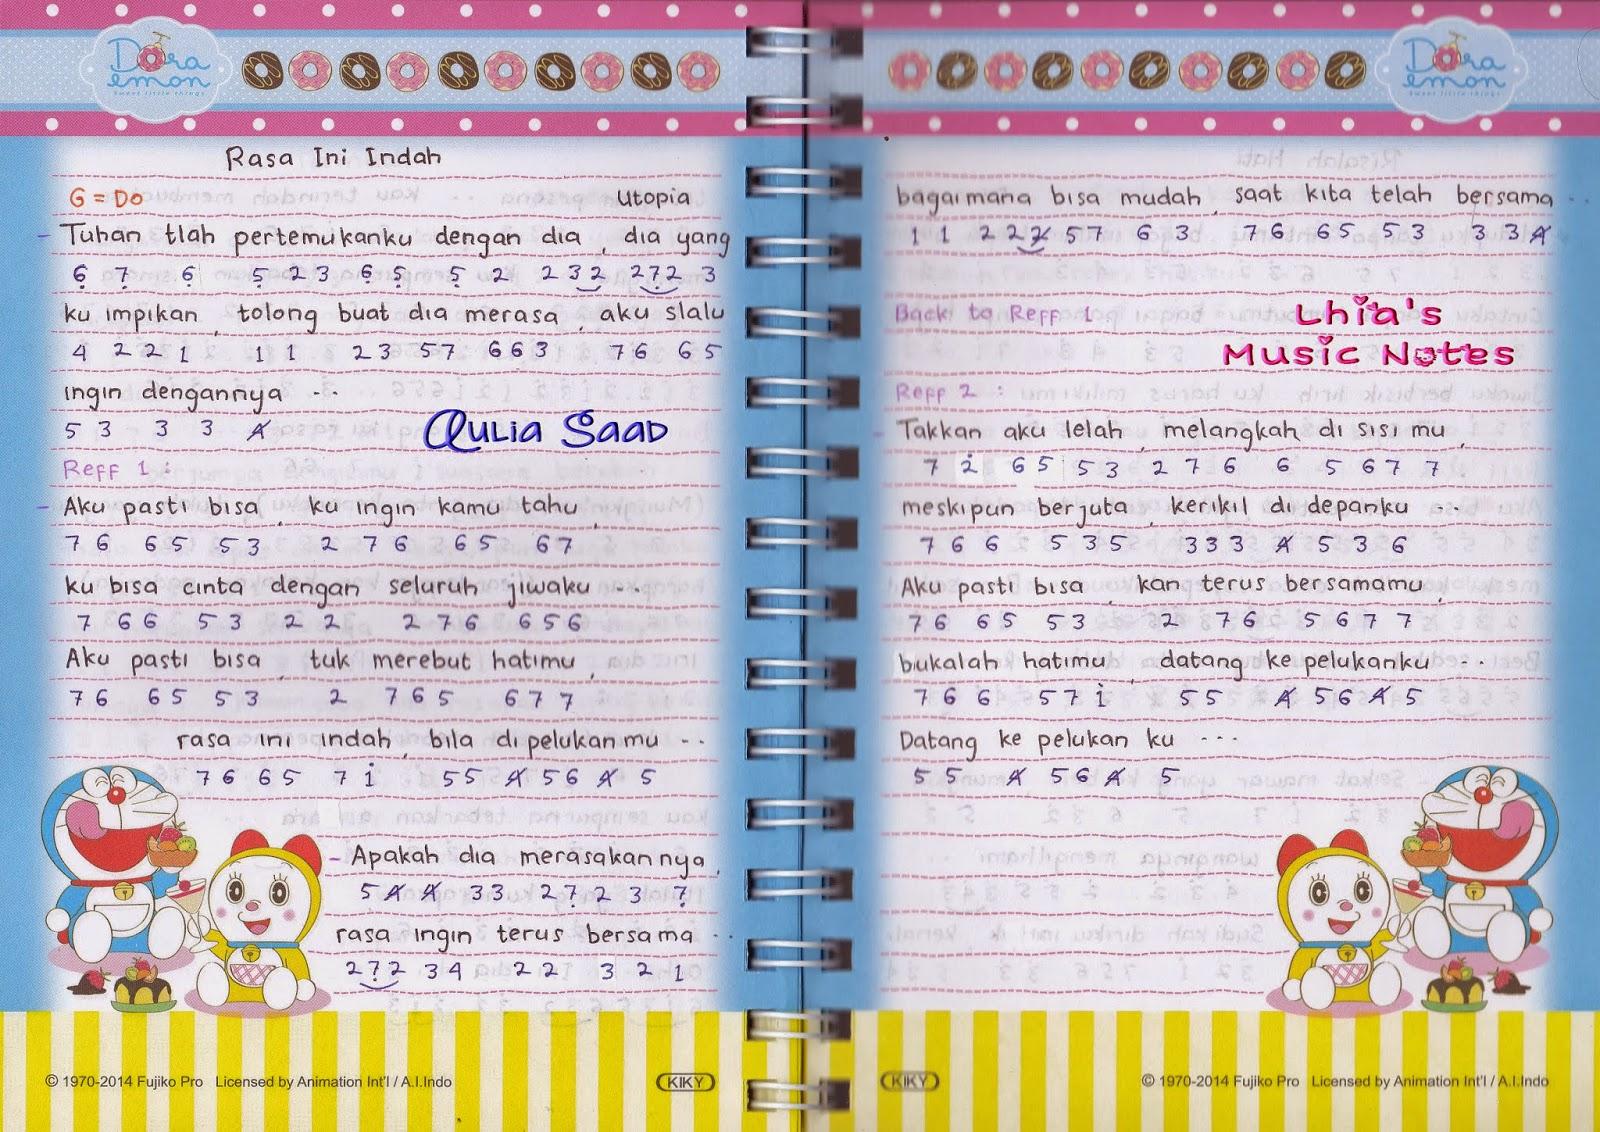 not angka lirik lagu utopia rasa ini indah | Lhia's Music Notes